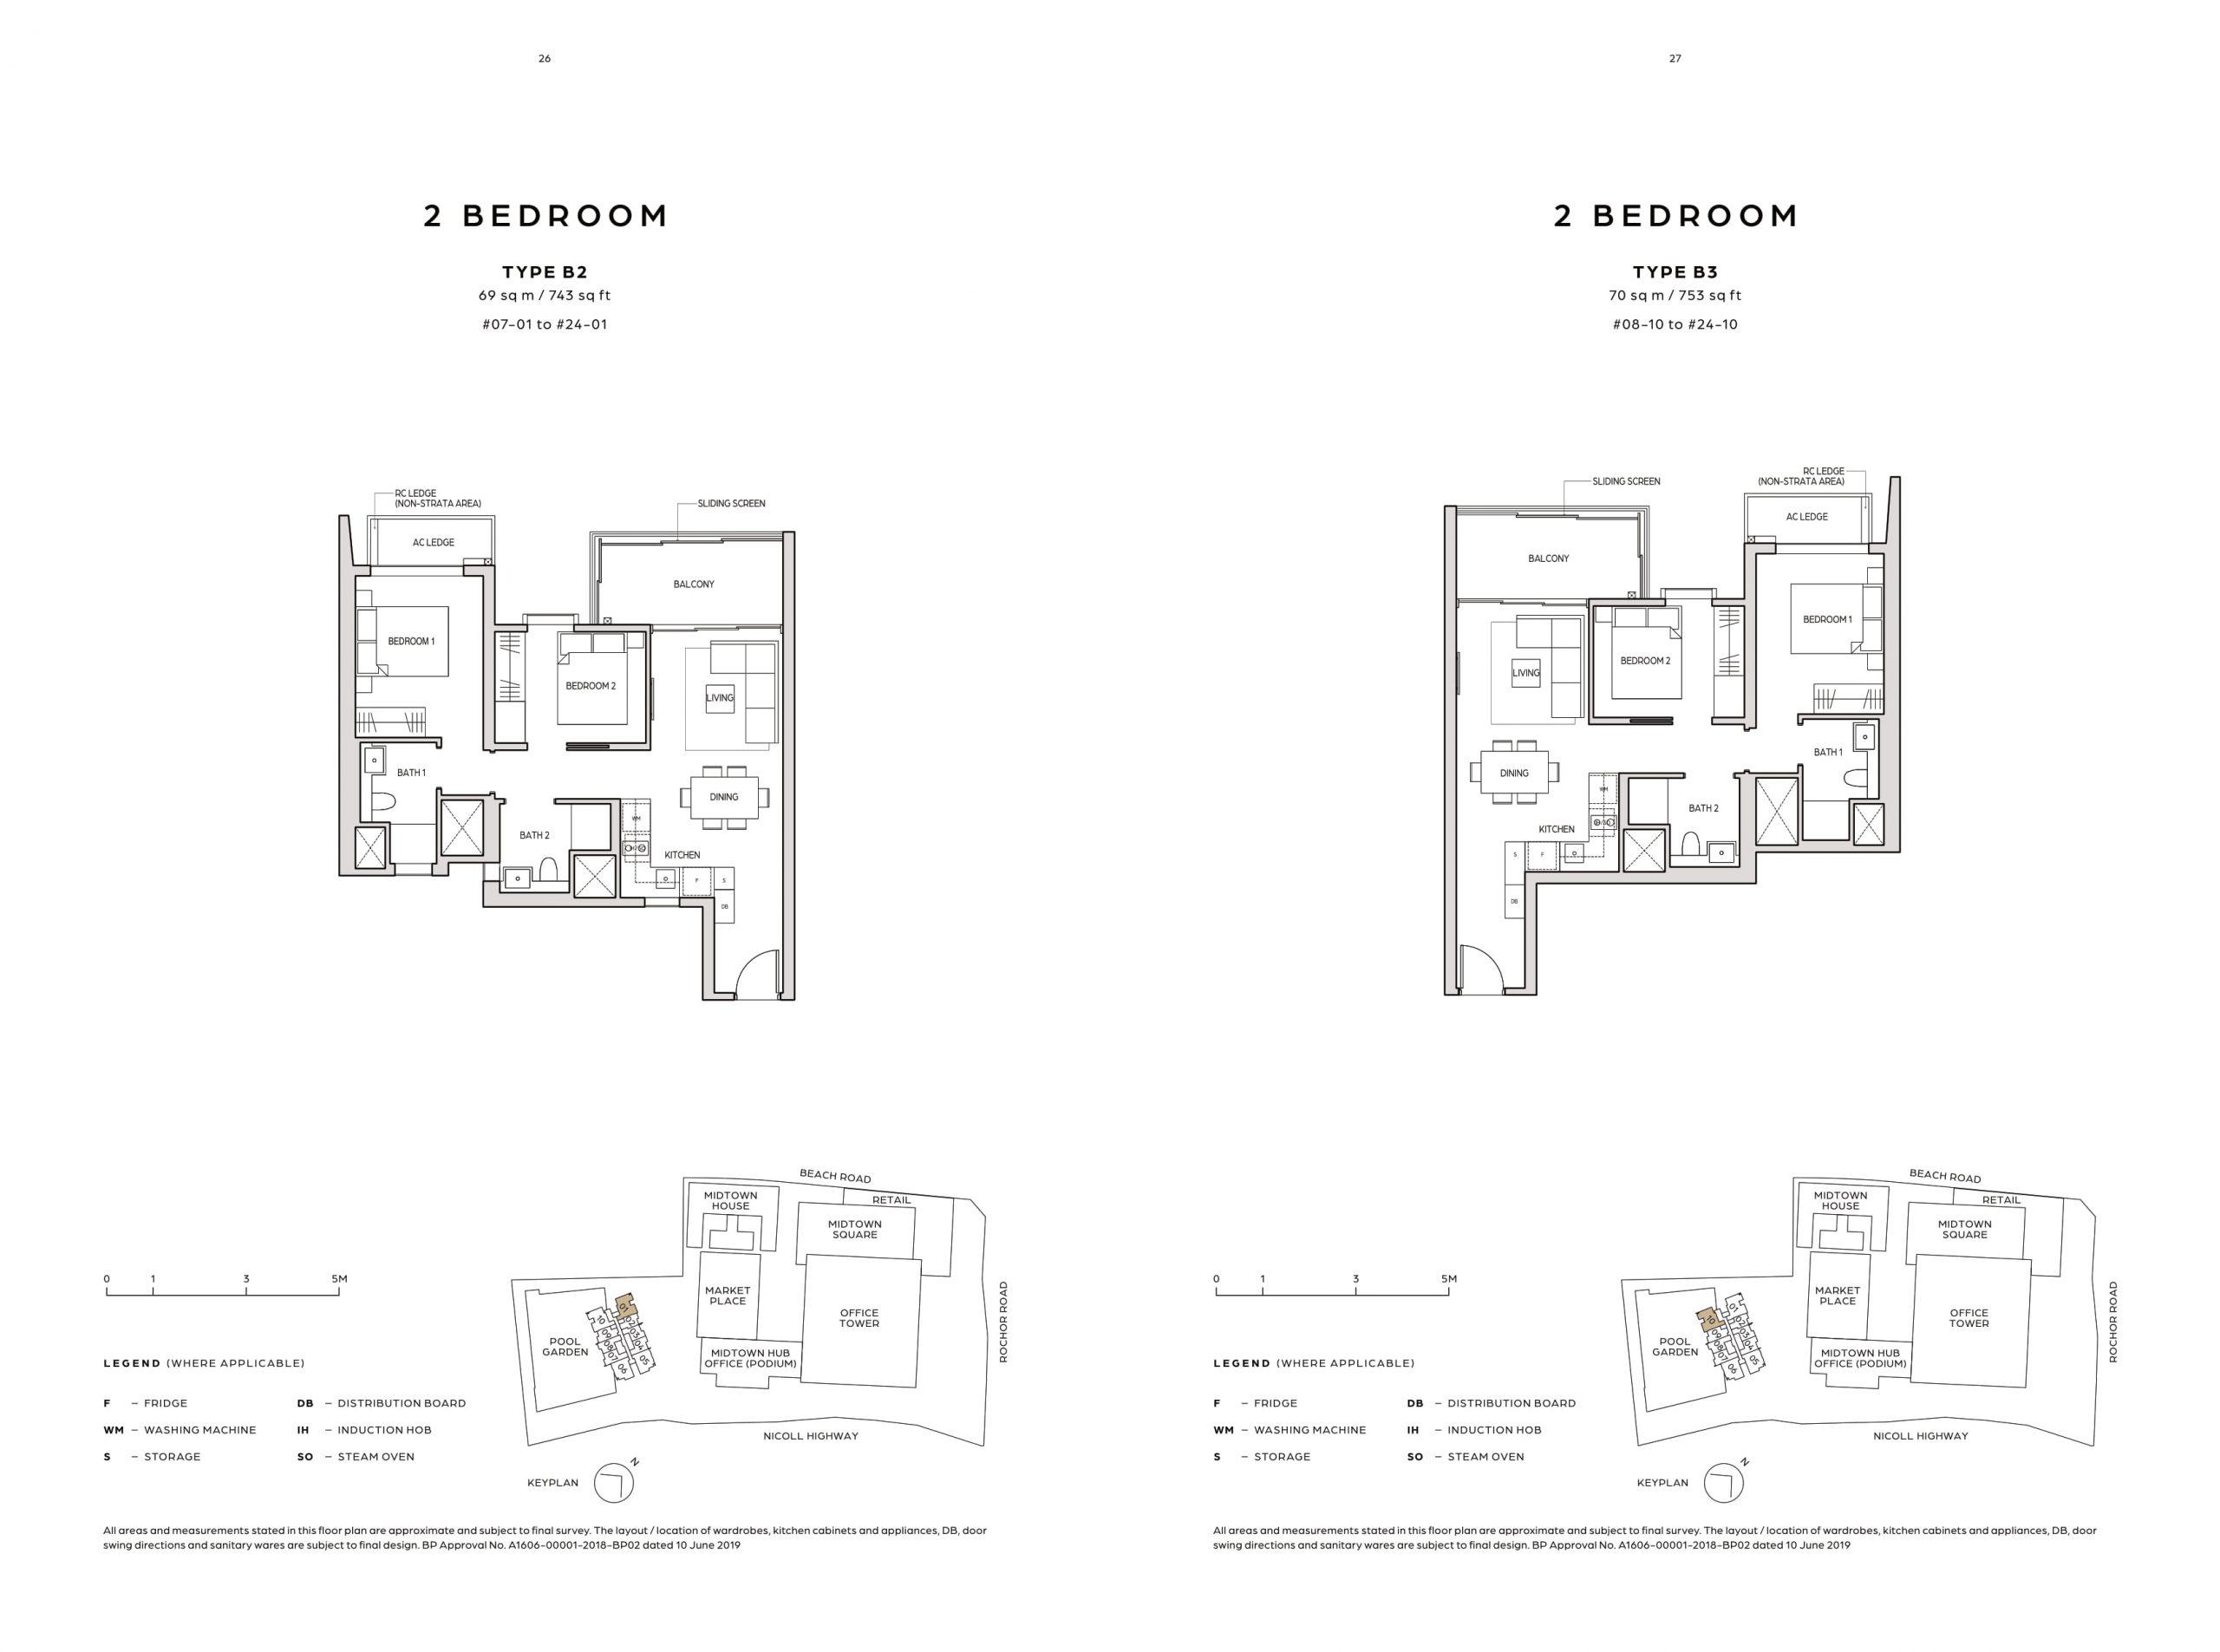 Midtown Bay's two-bedroom types